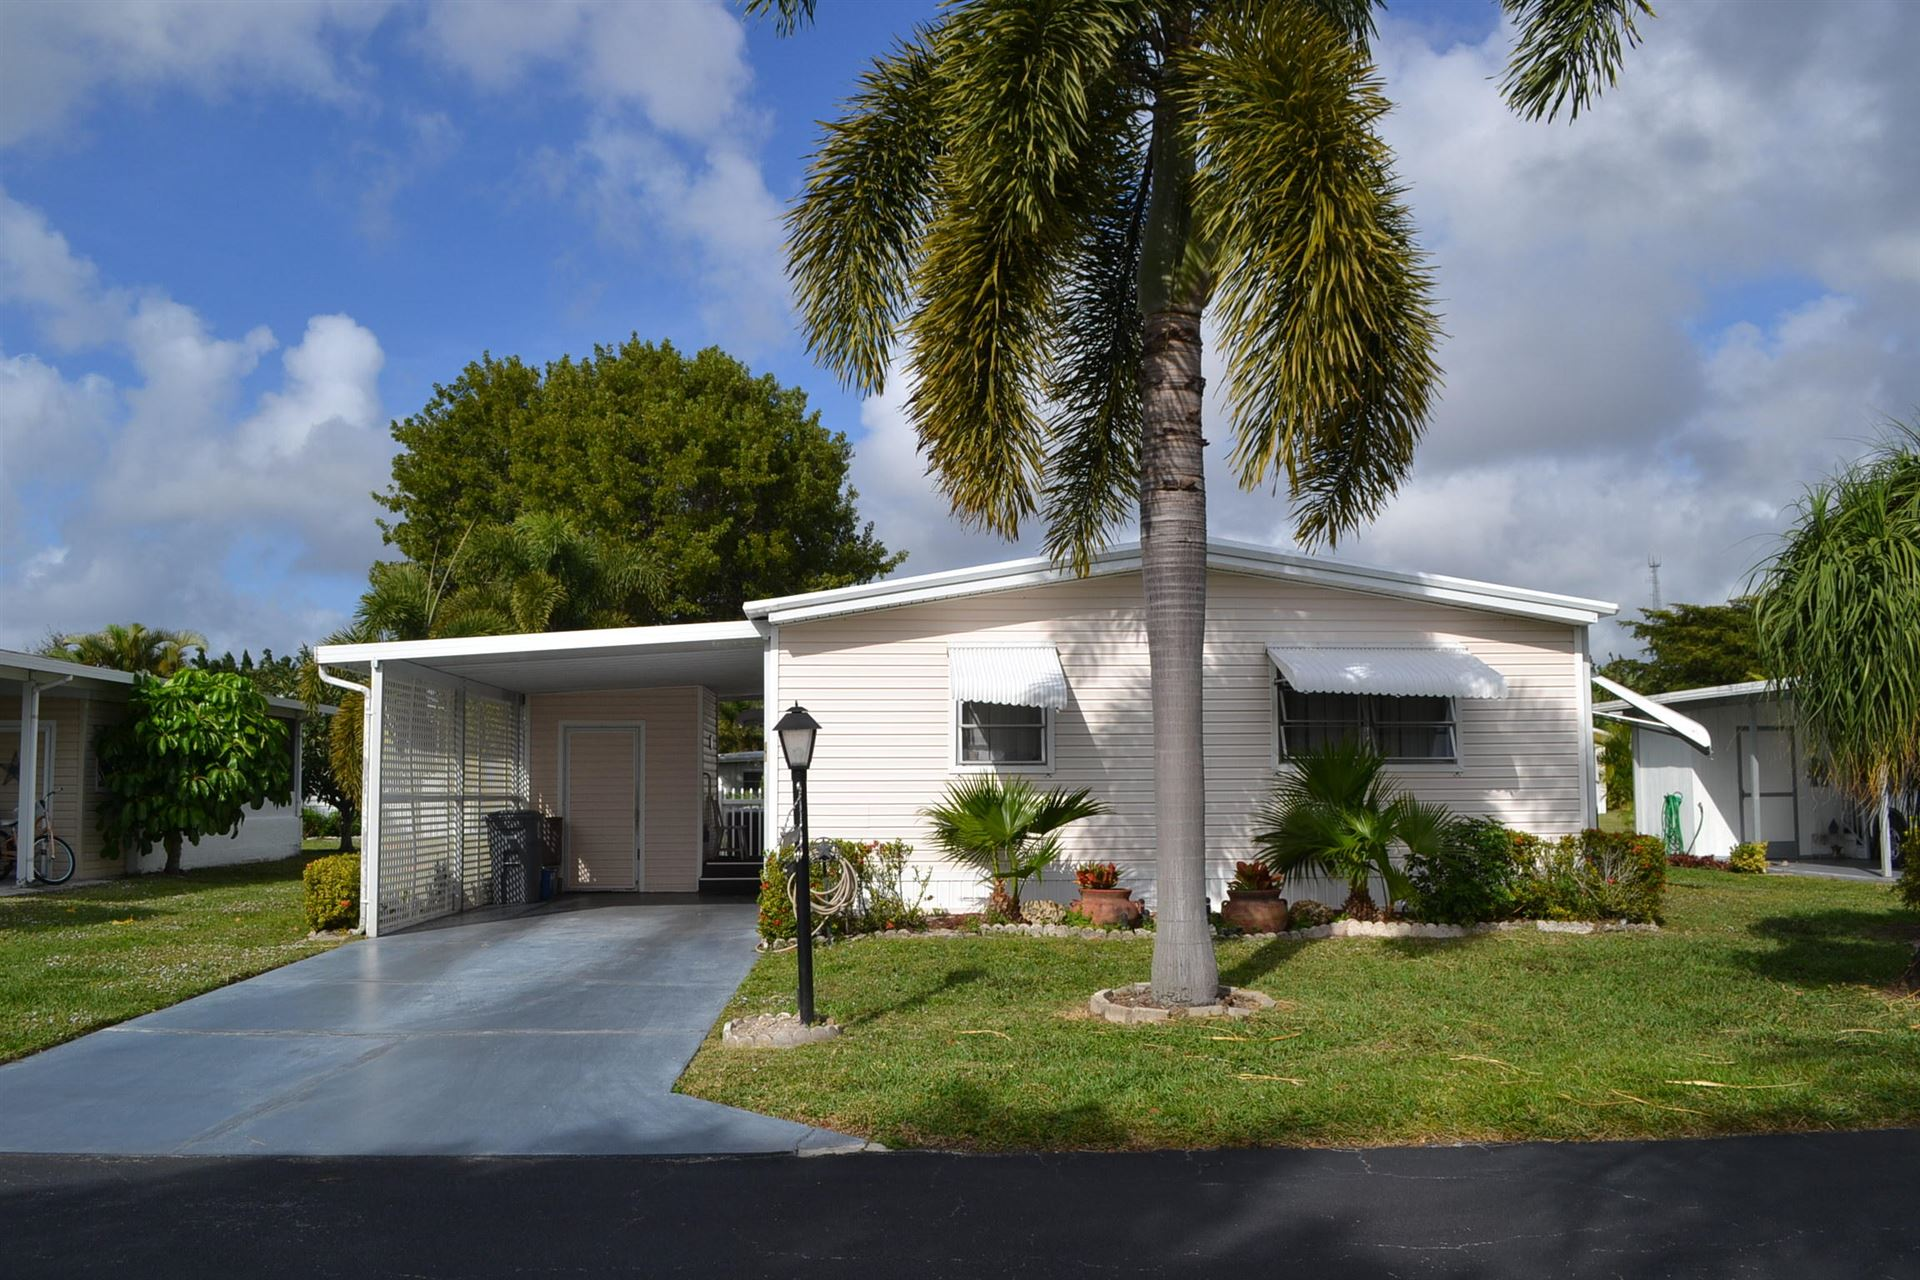 20903 Sunrise Drive, Boca Raton, FL 33433 - MLS#: RX-10601204